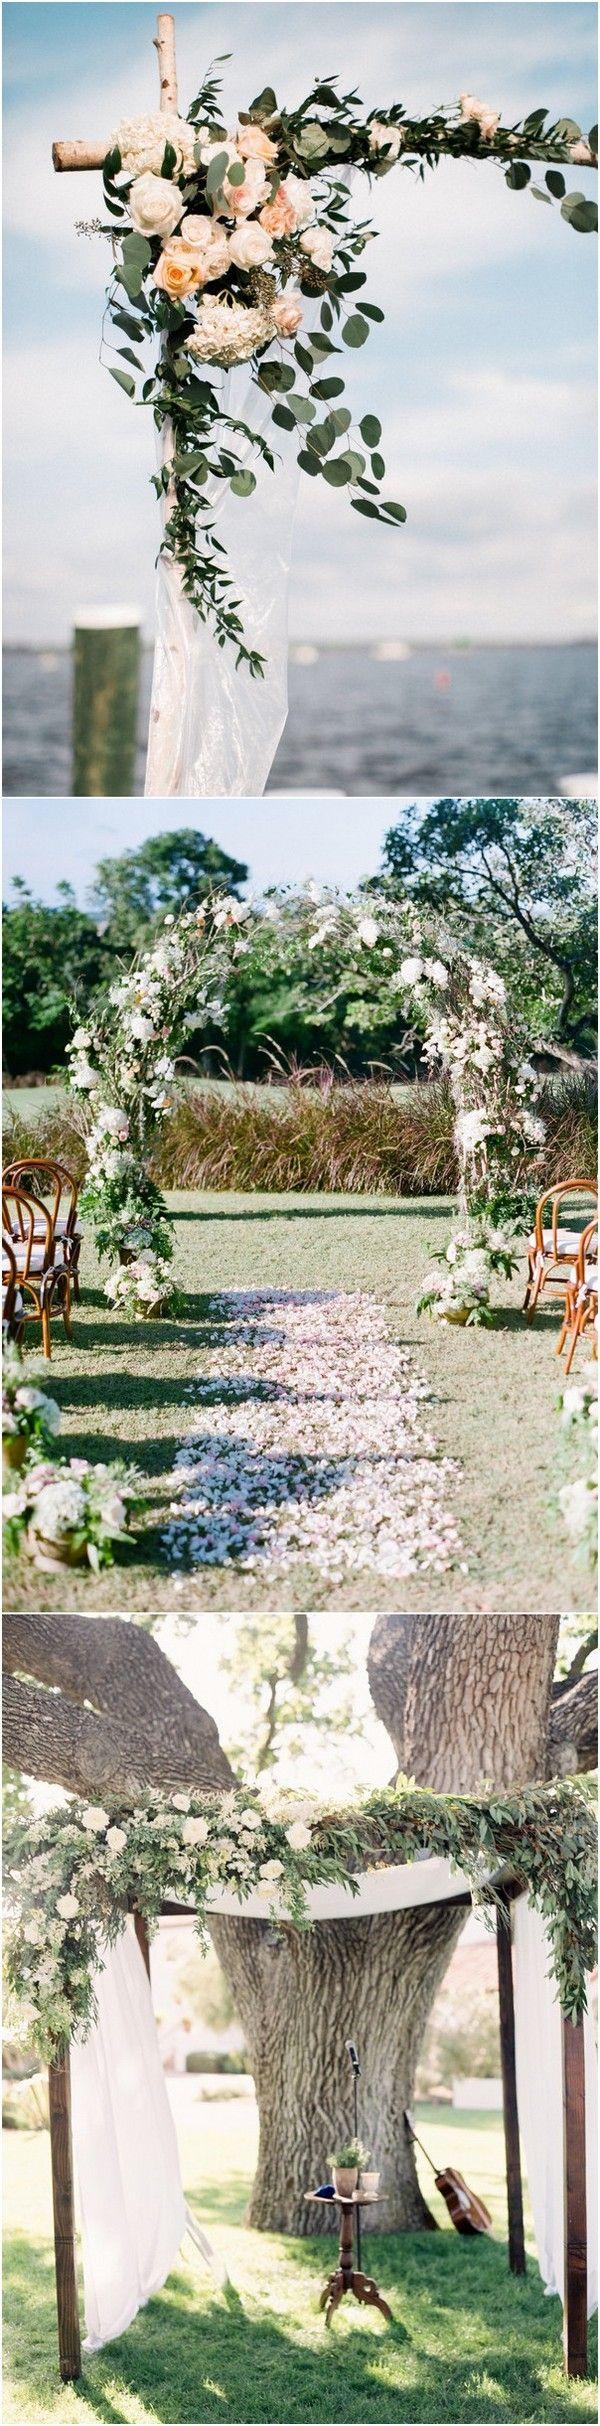 backyard wedding ceremony decoration ideas%0A    Prettiest Floral Wedding Arch Decoration Ideas